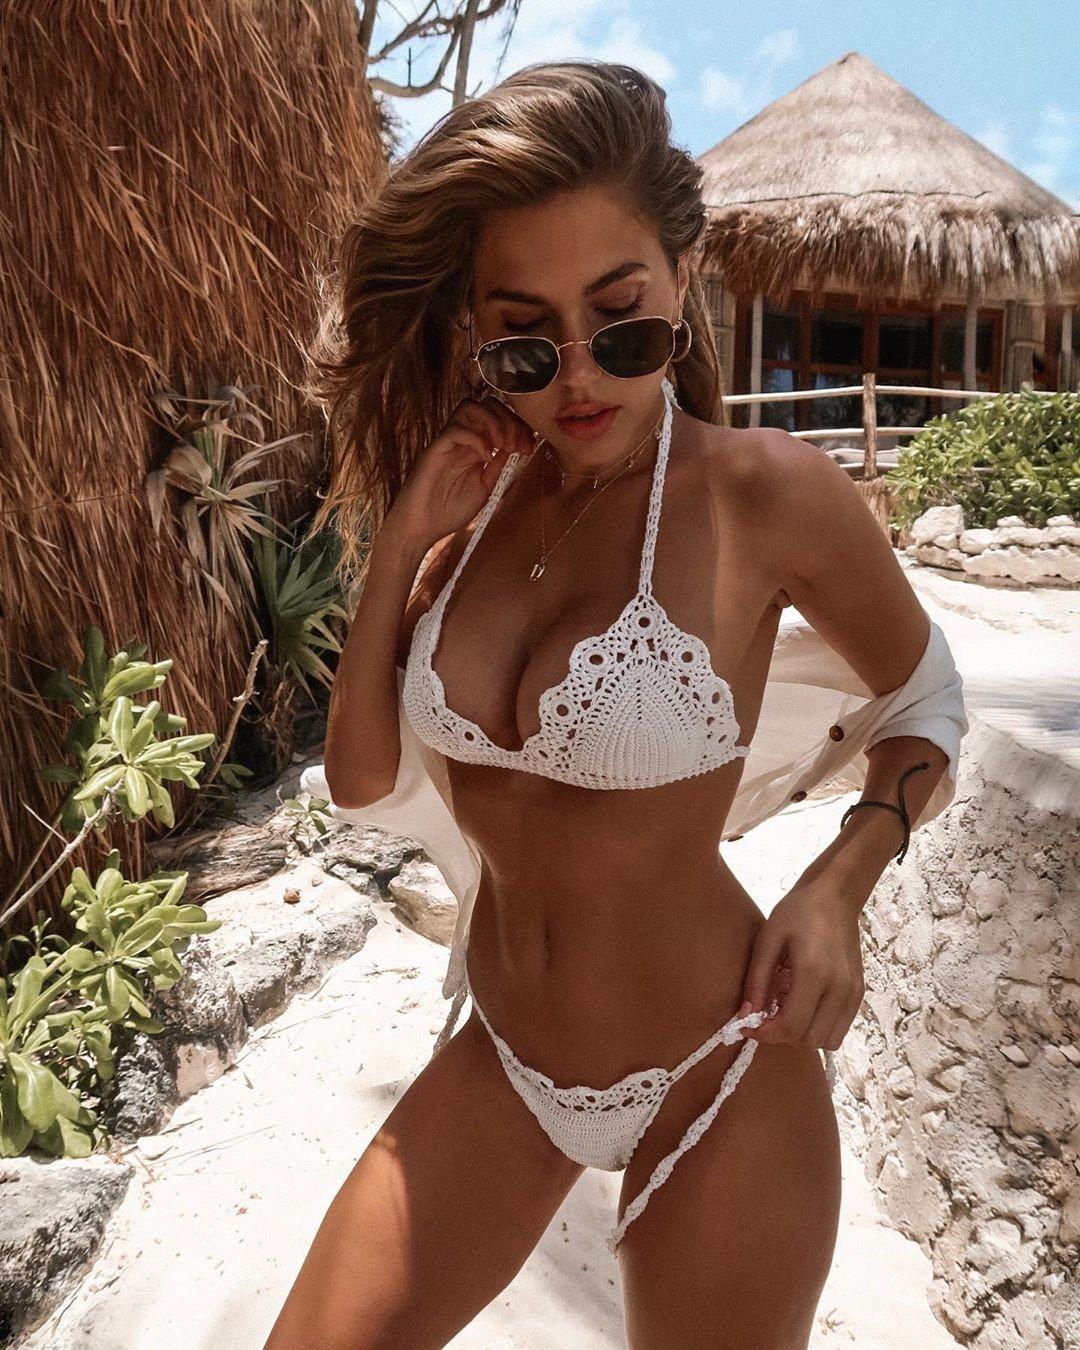 Kara Del Toro Pics and Vids in Bikini